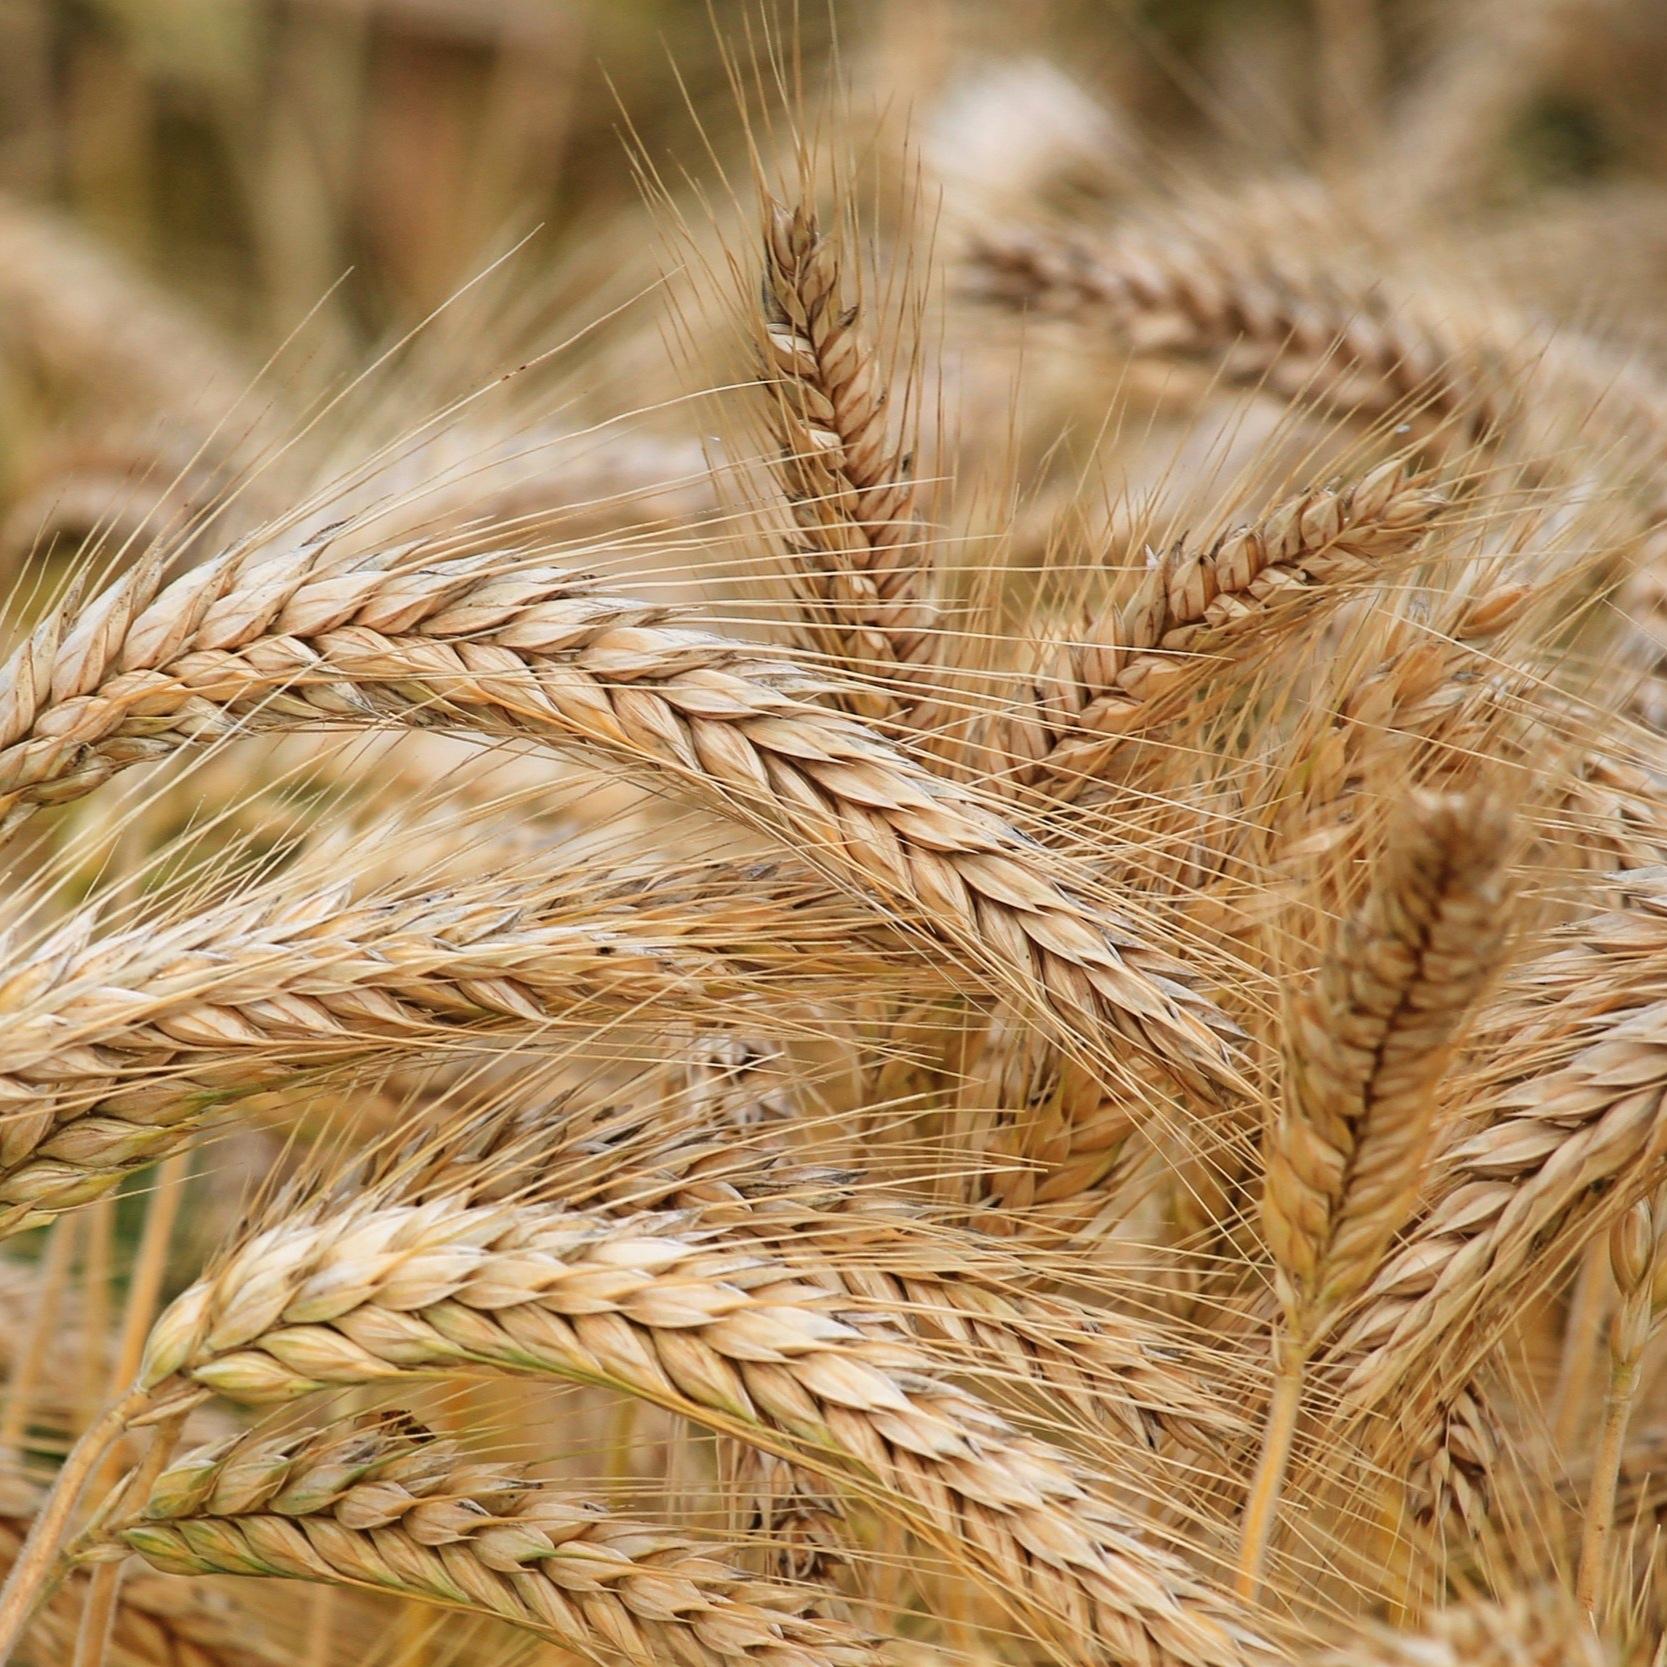 cereal-close-up-crop-326082.jpg